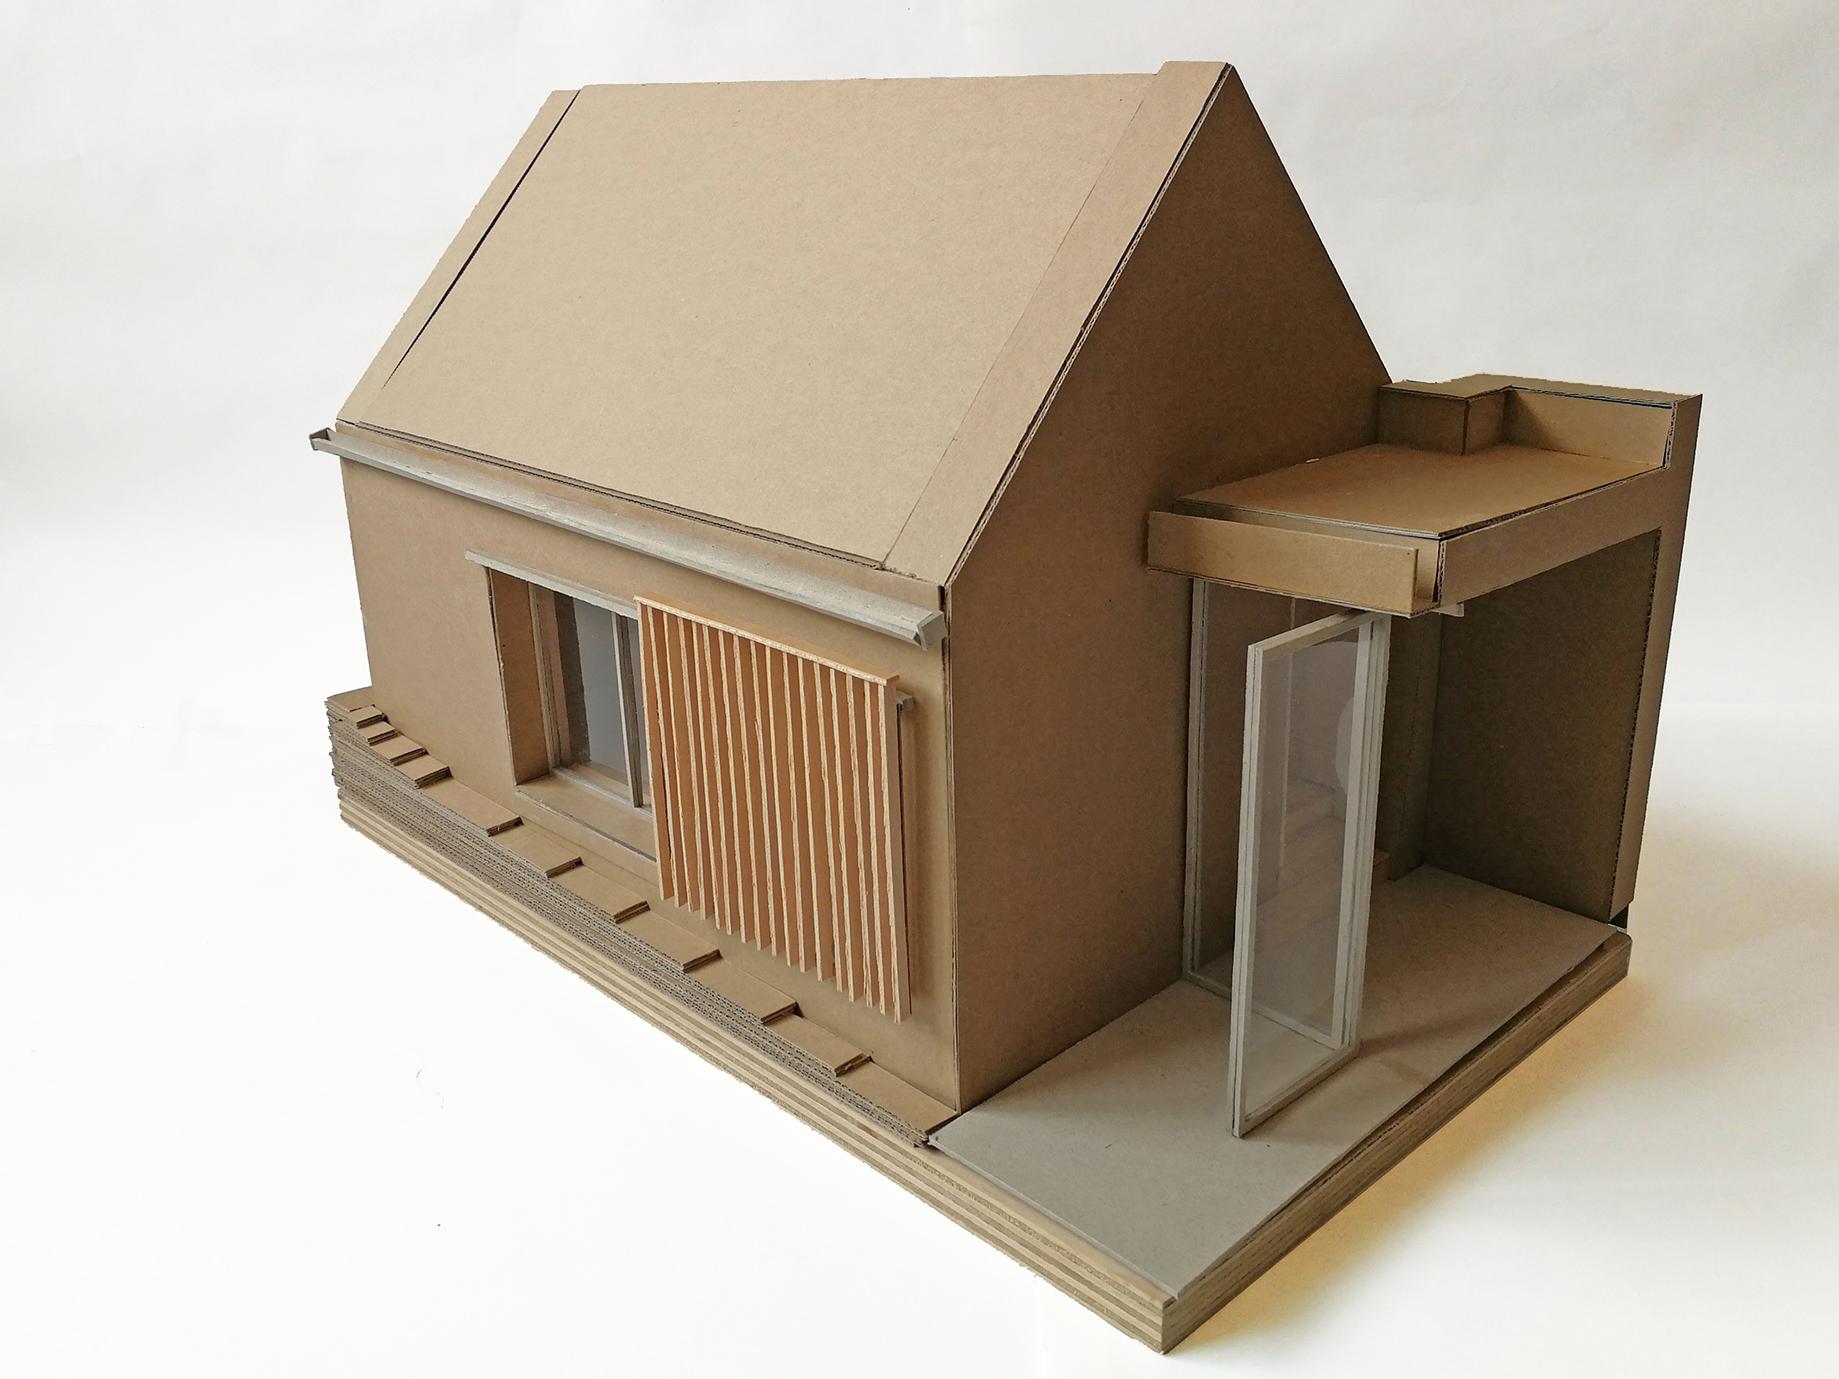 harper-perry-architects-barn-conversion-model-development